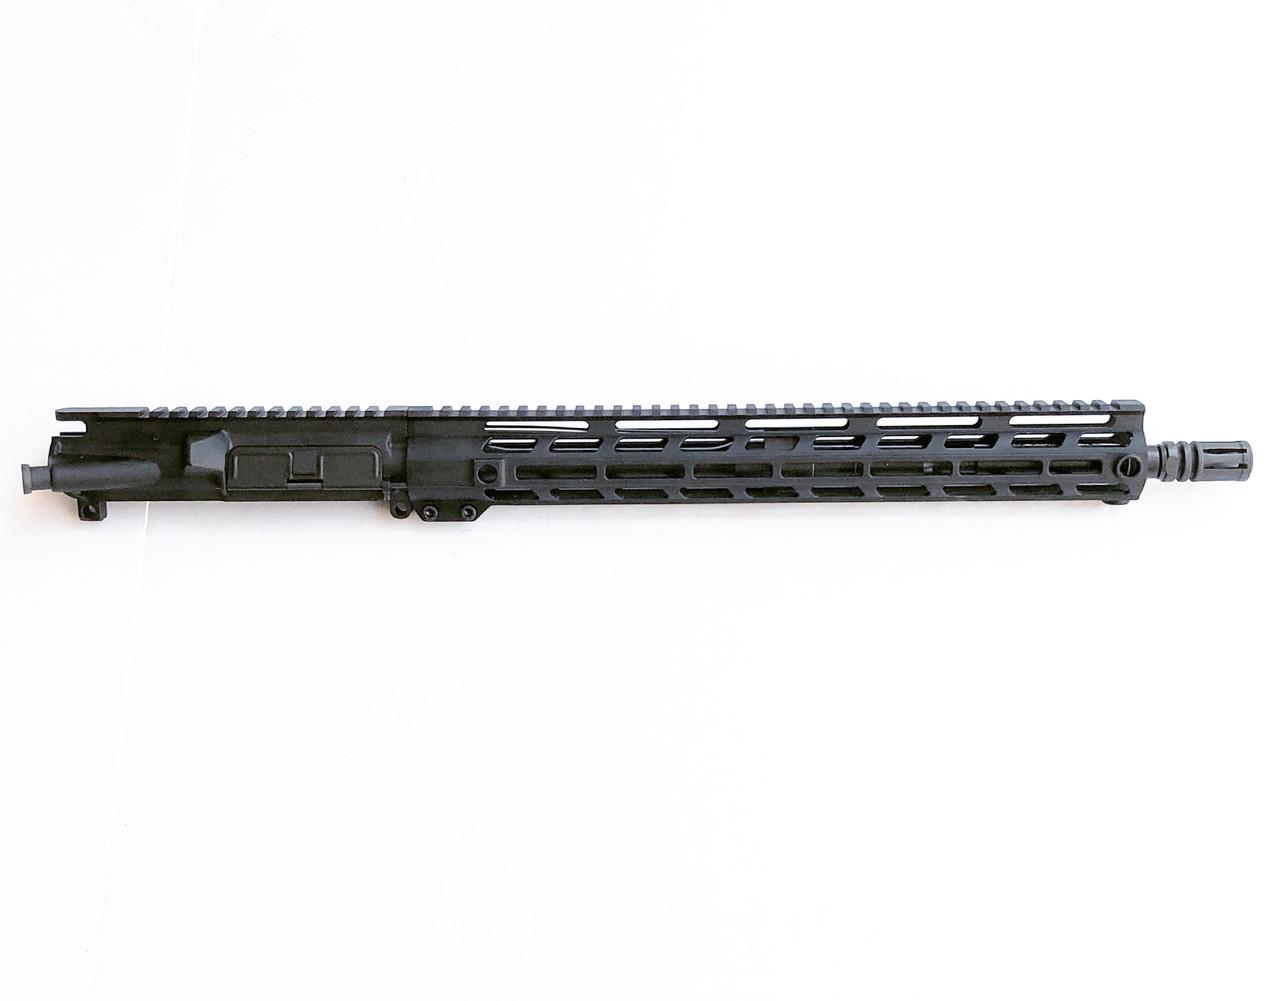 "AR-15 Upper Receiver, .300 Blackout, 16"" Parkerized Heavy Barrel, 1:8 Twist, Pistol Gas System"